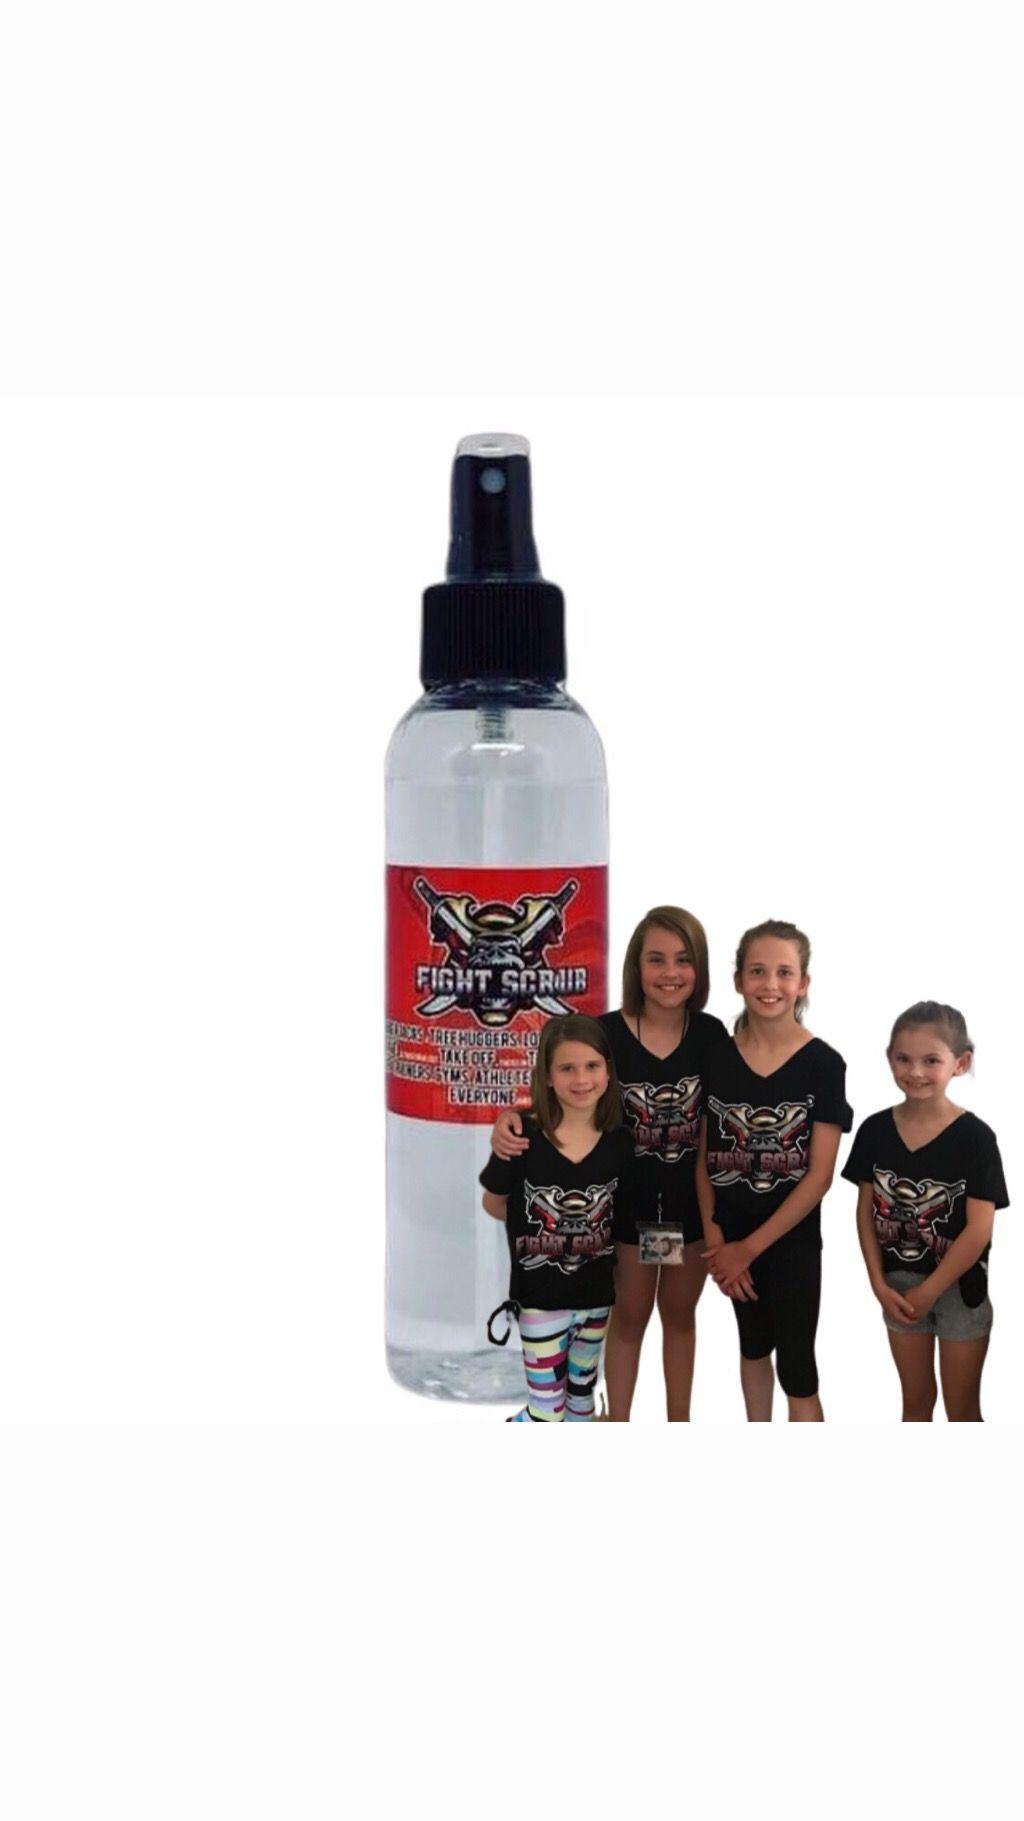 Pin On Fight Scrub Defender Spray Antibacterial Spray Essential